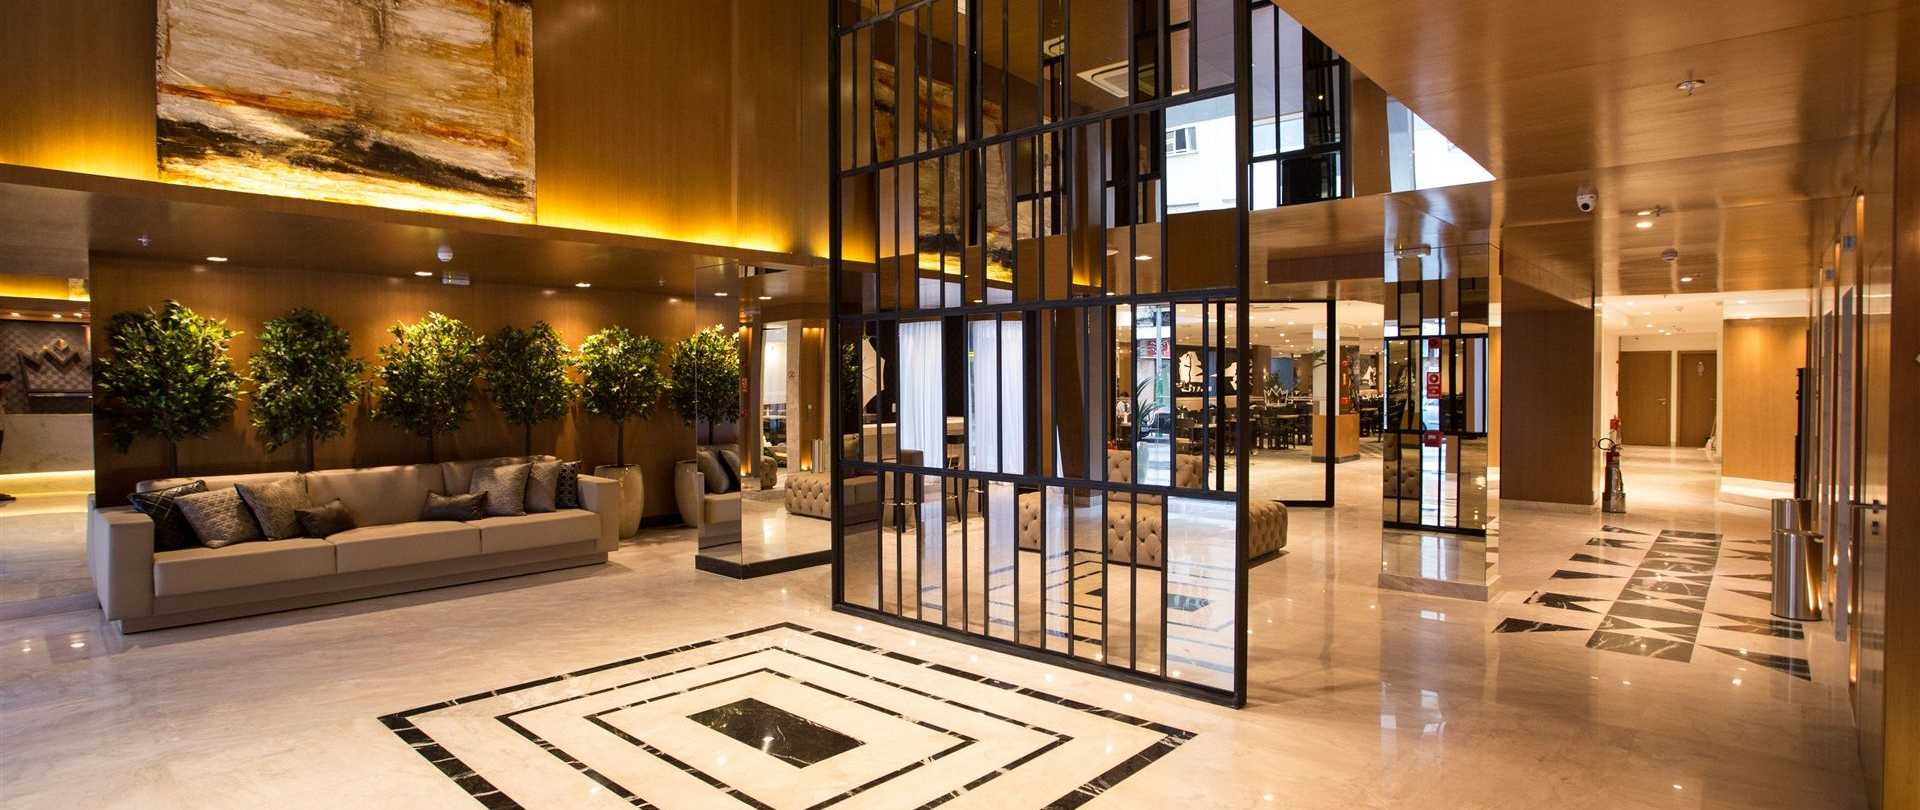 Mármore Branco - Hotel Royal Regency